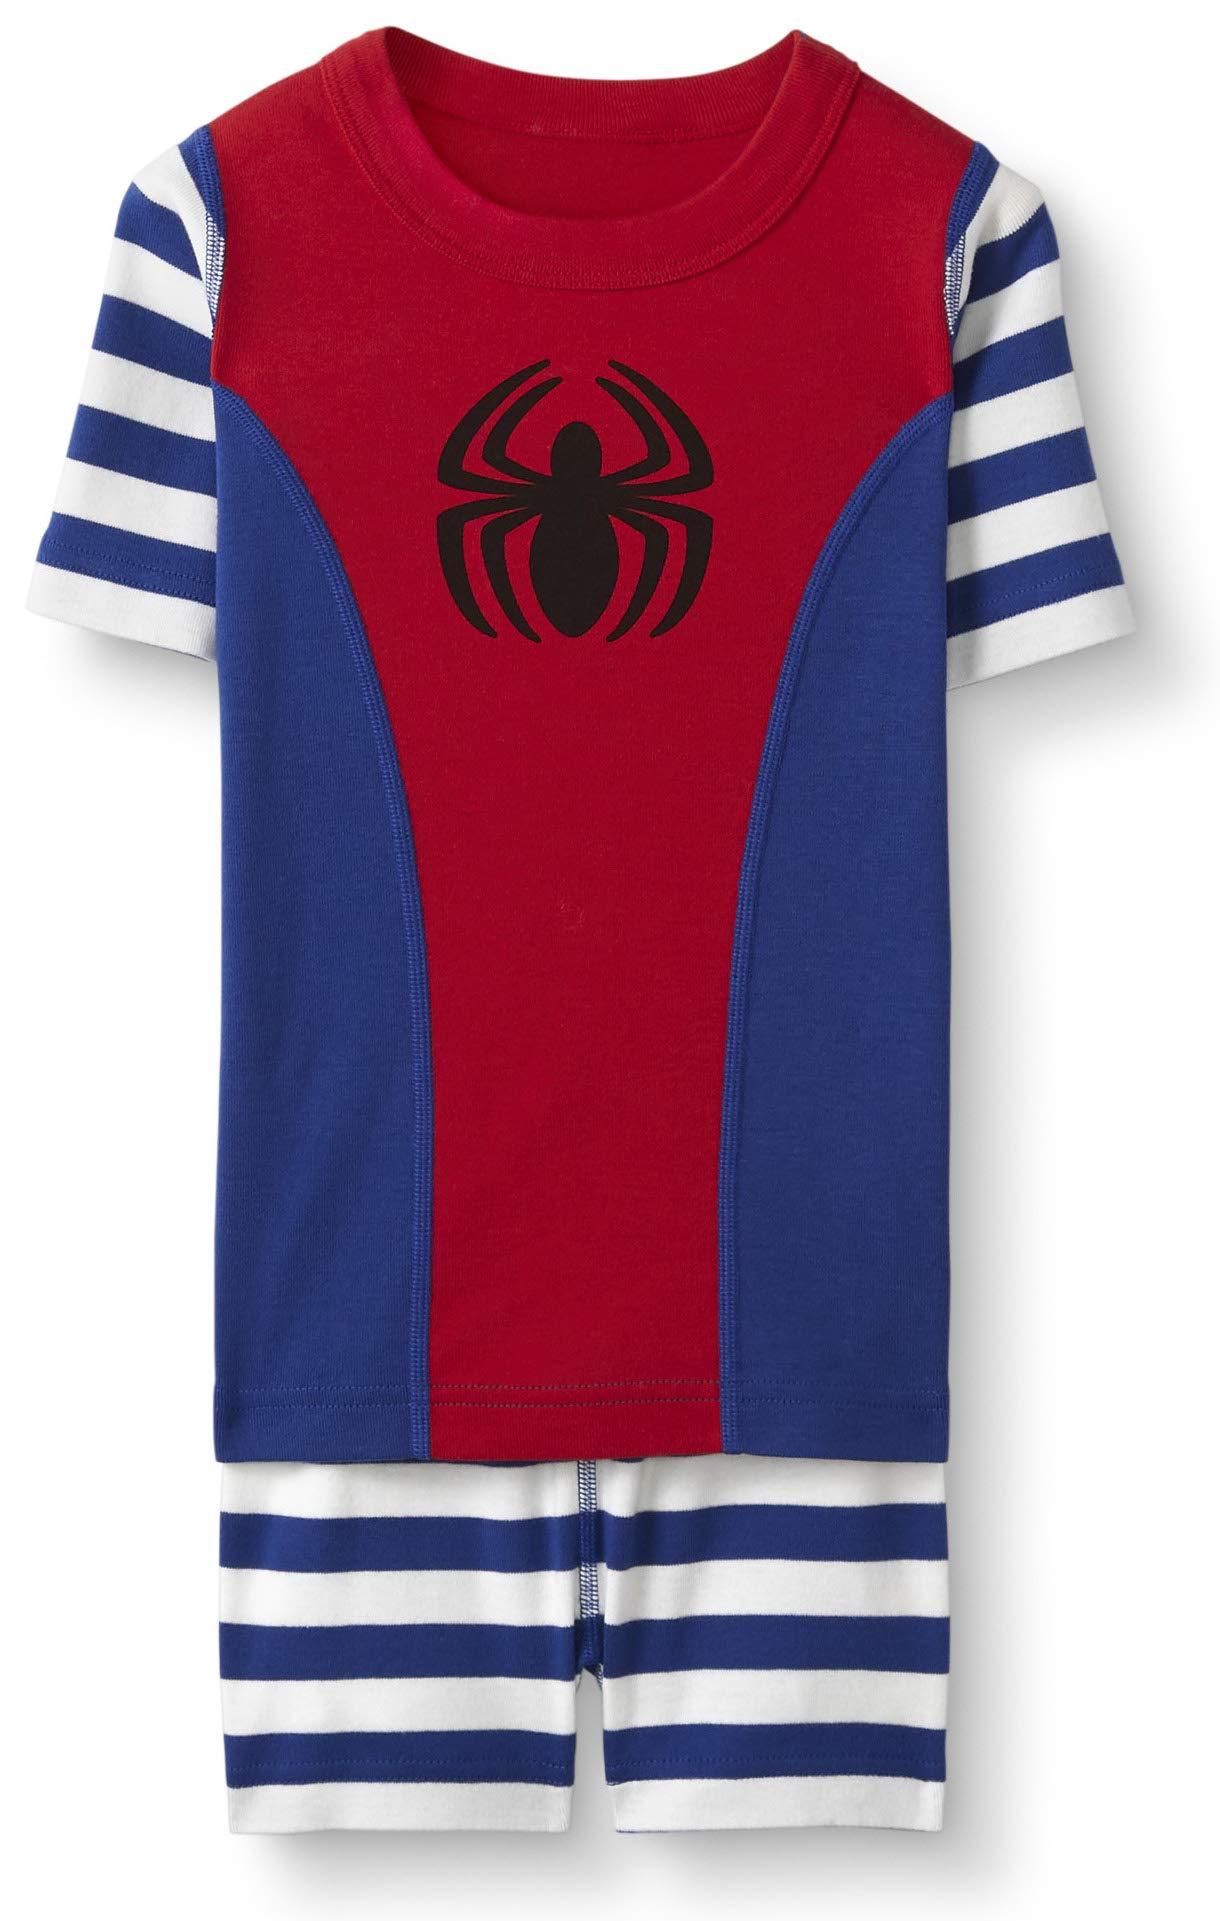 Hanna Andersson Kids Marvel's Spider-Man Short John Pajamas in Organic Cotton